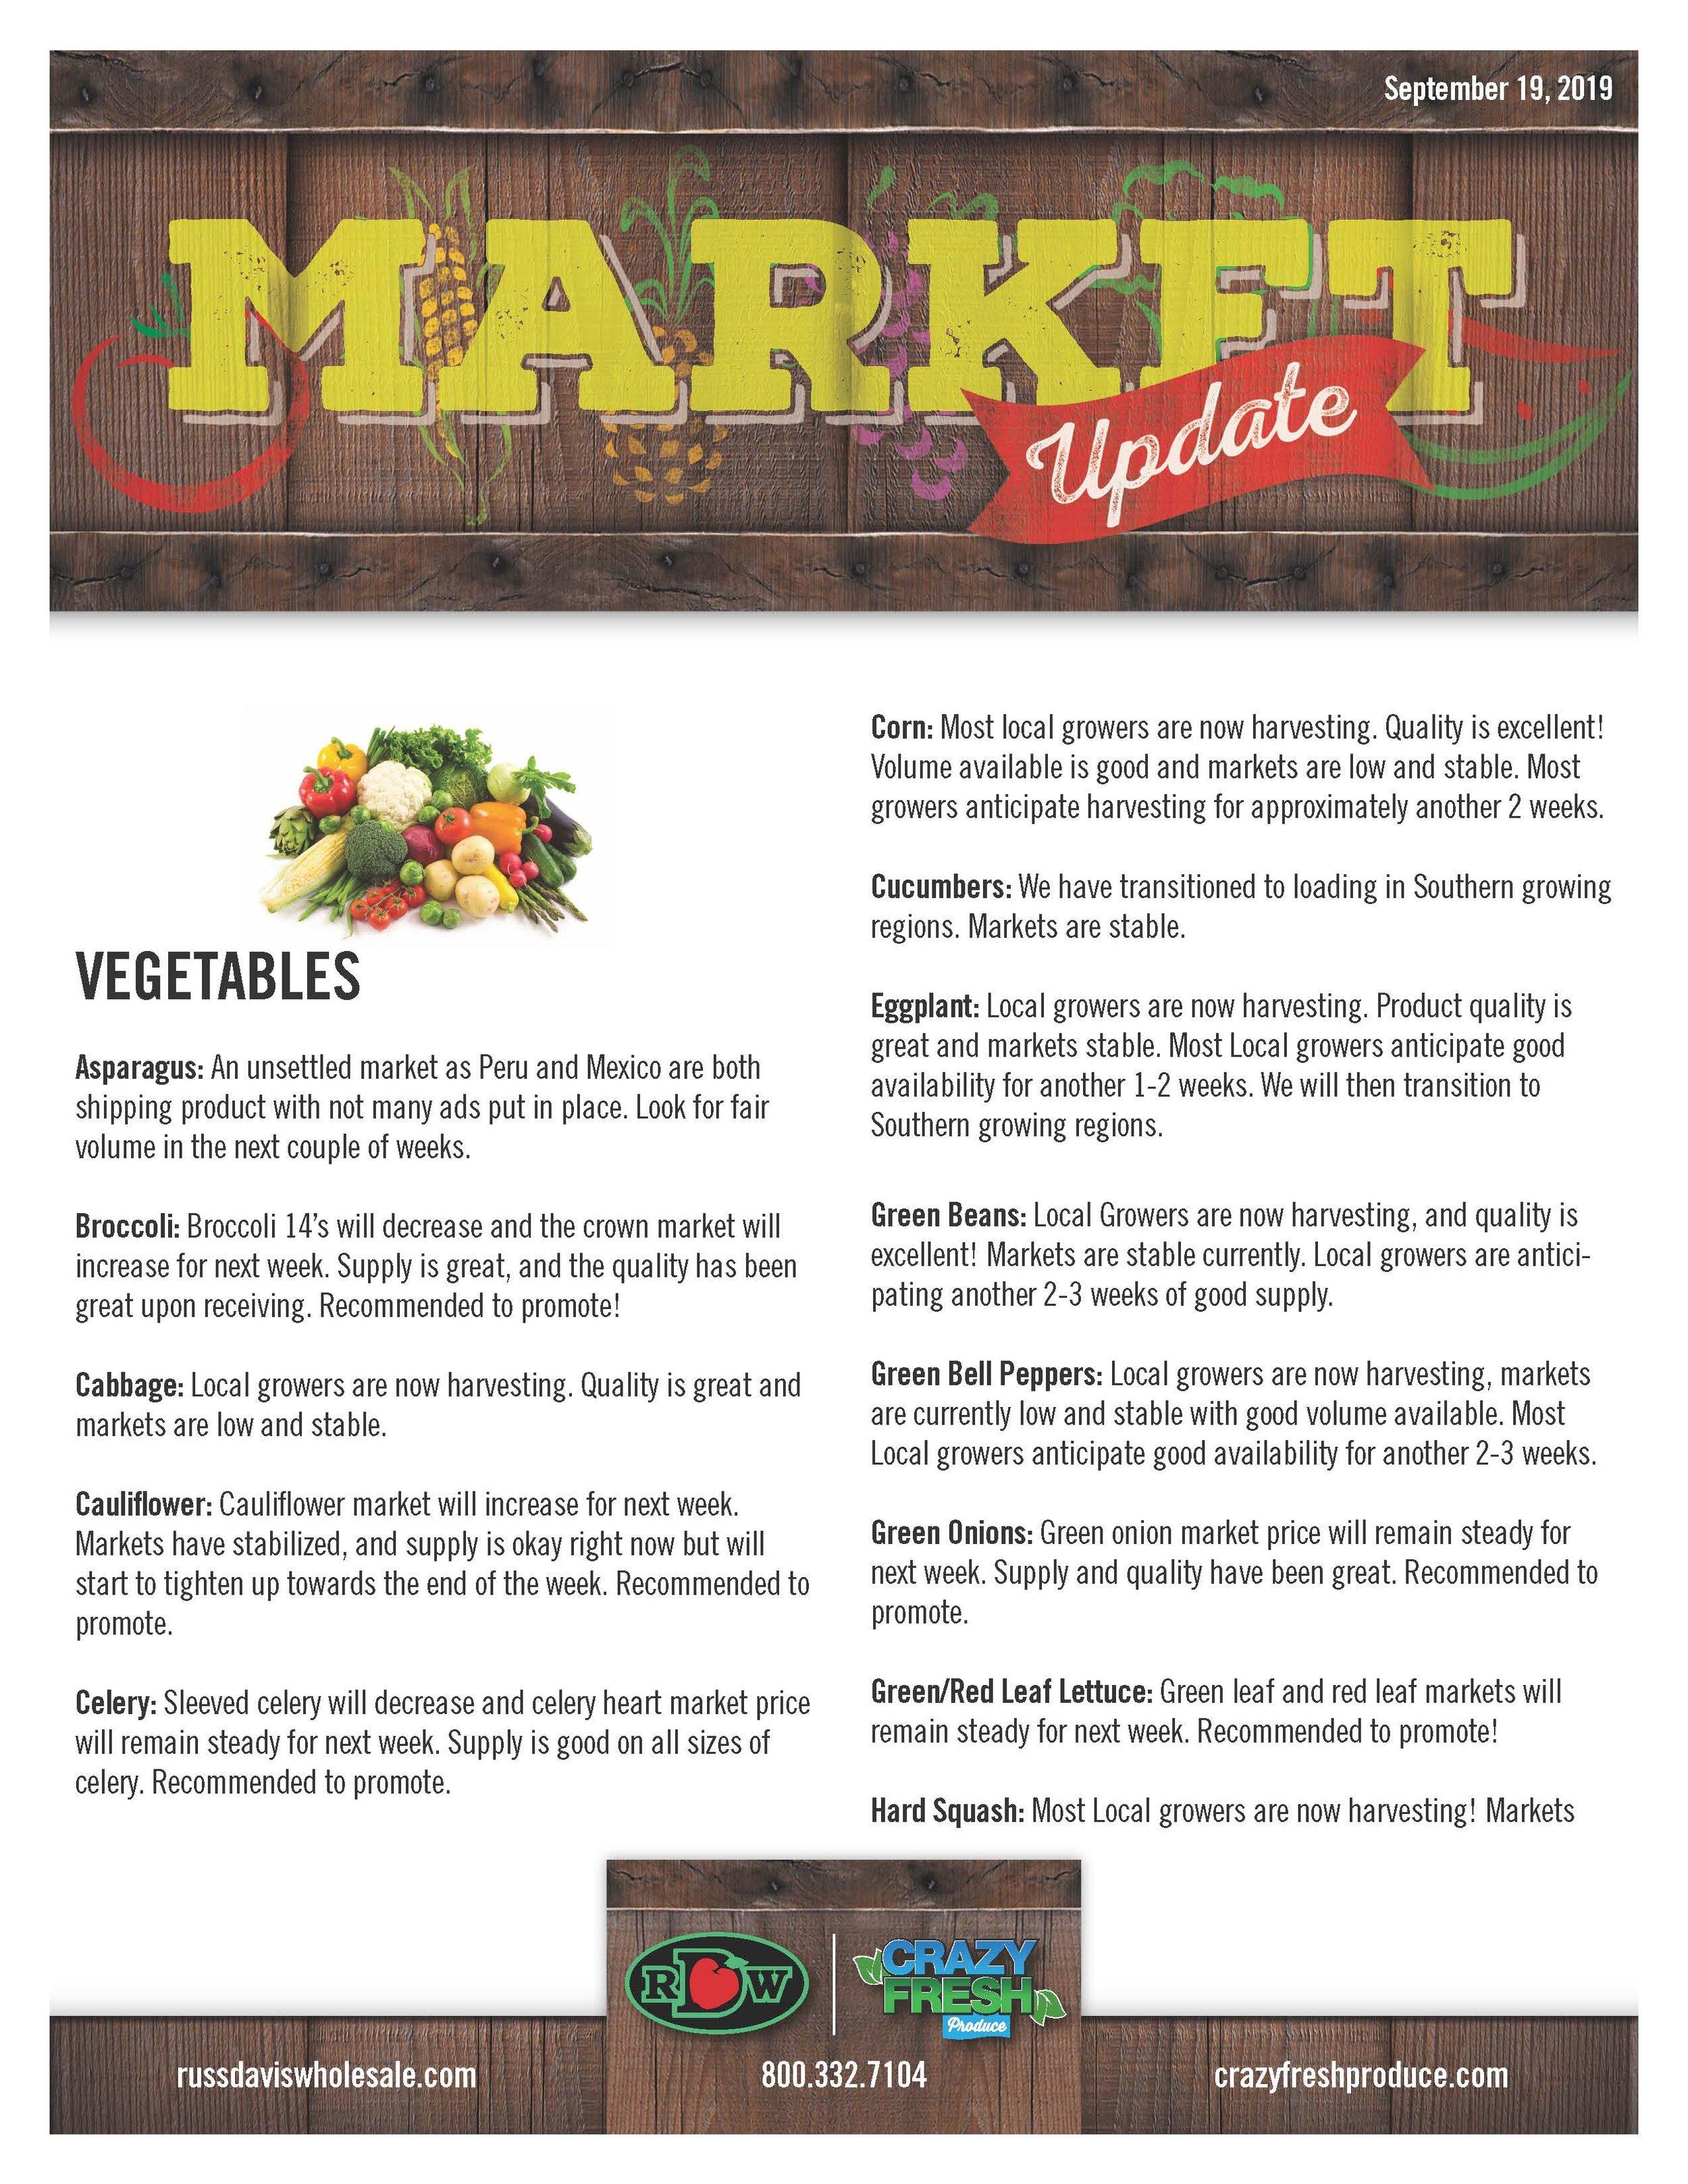 RDW_Market_Update_Sep19_19_Page_1.jpg